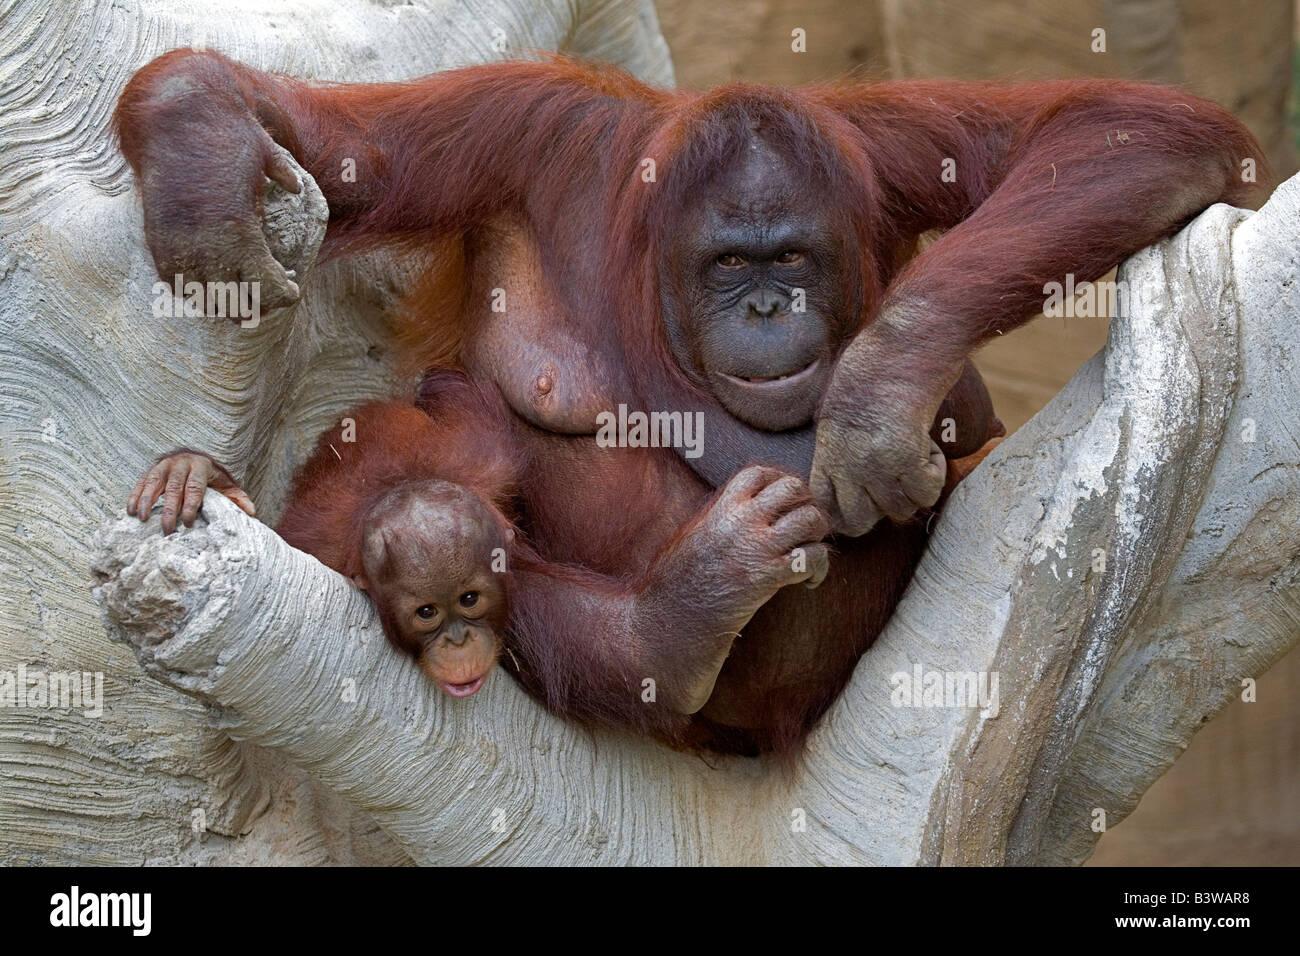 Nursing orangutan and baby portrait Stock Photo